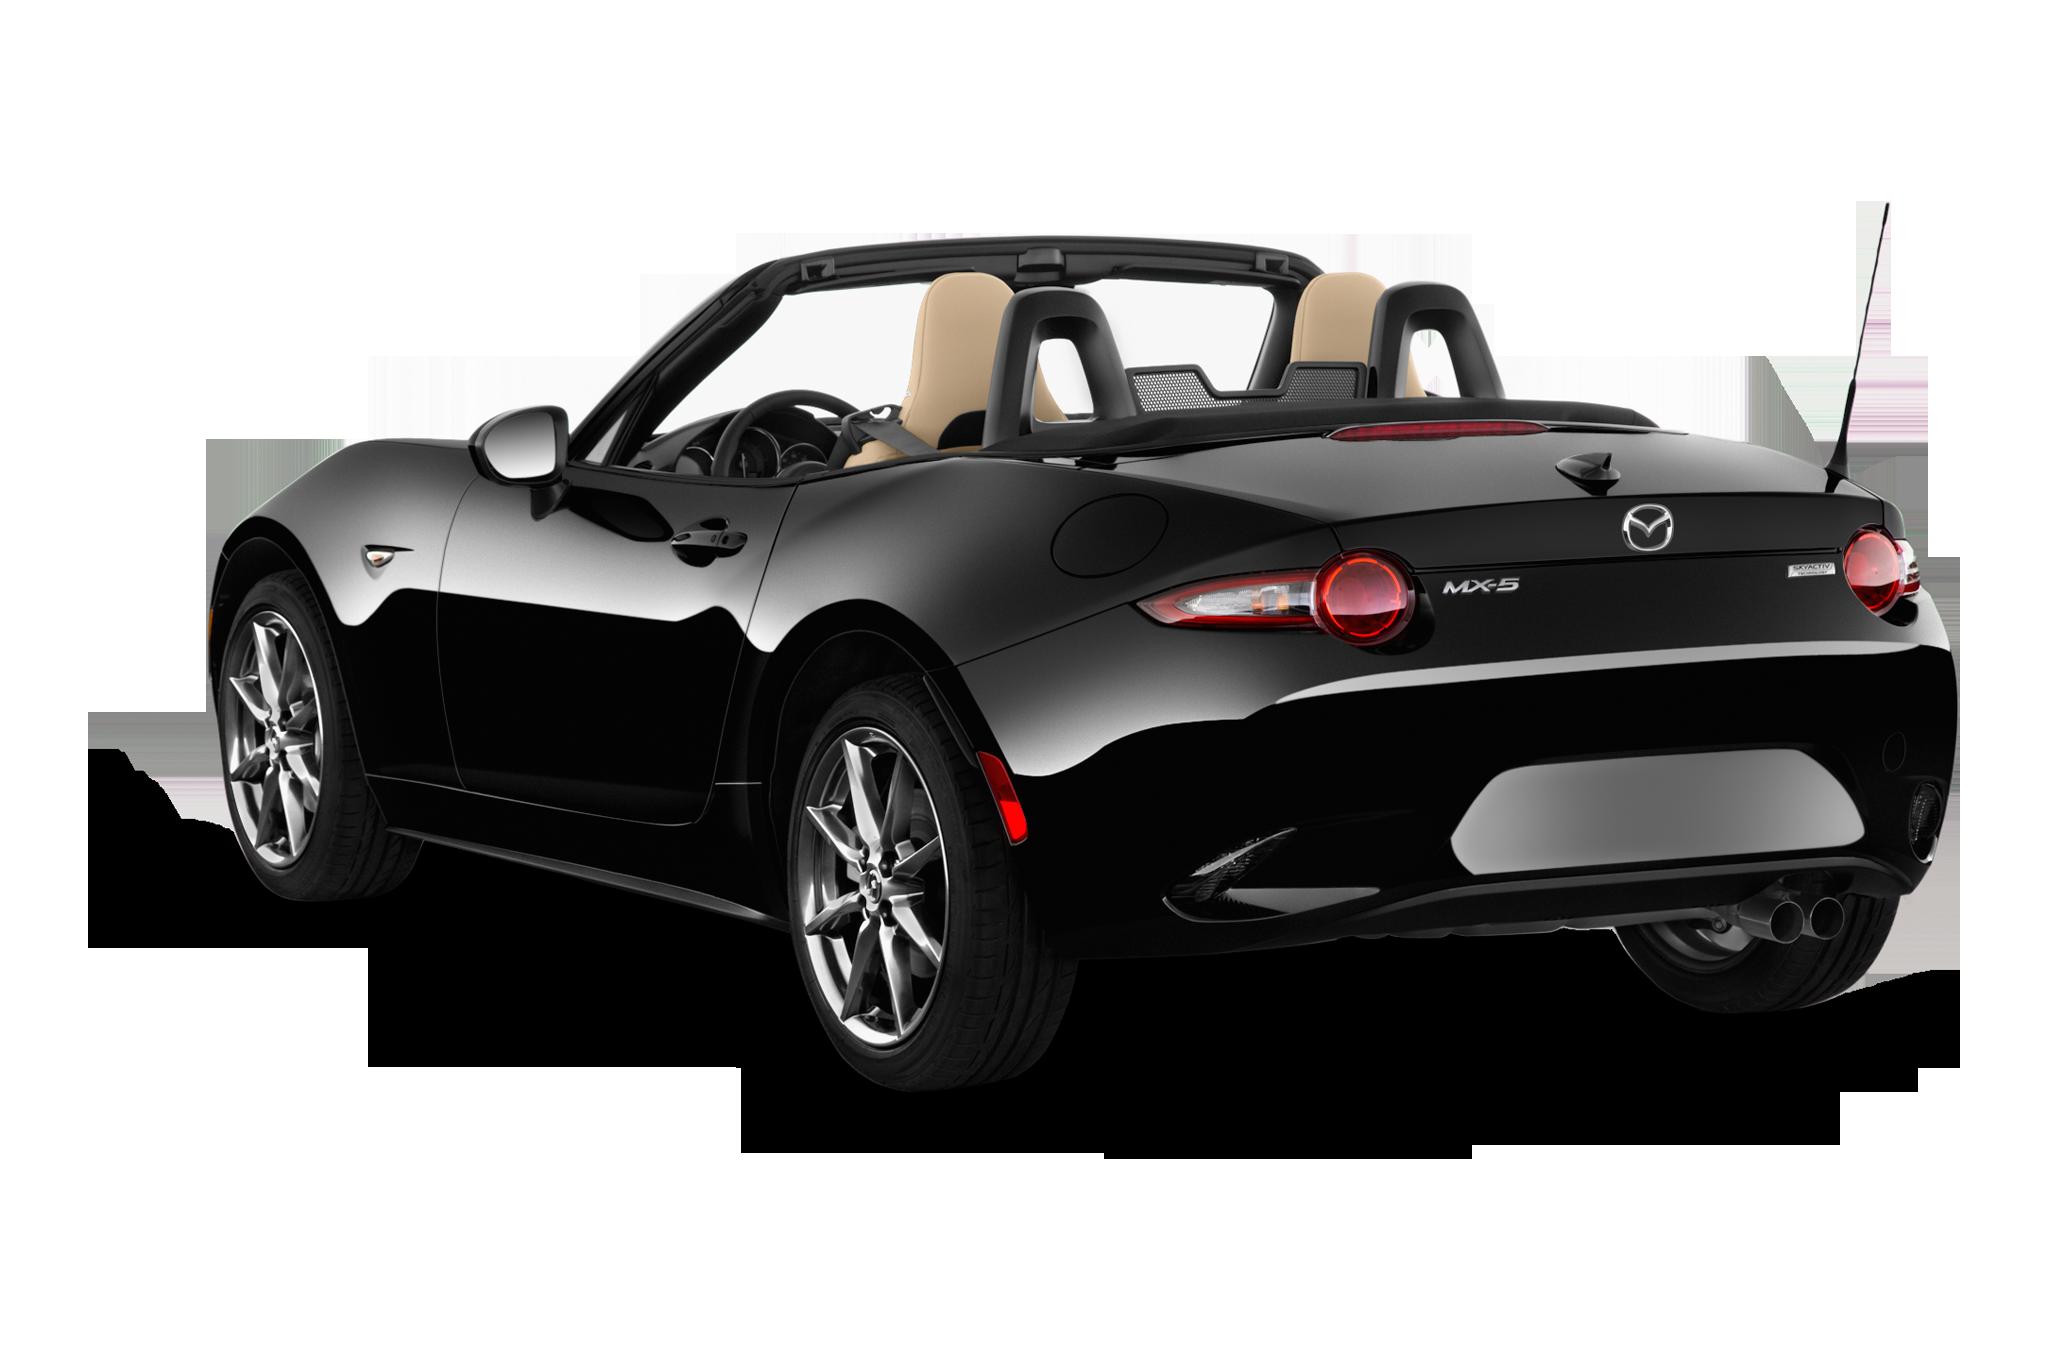 2016 Mazda Mx 5 Miata Revealed